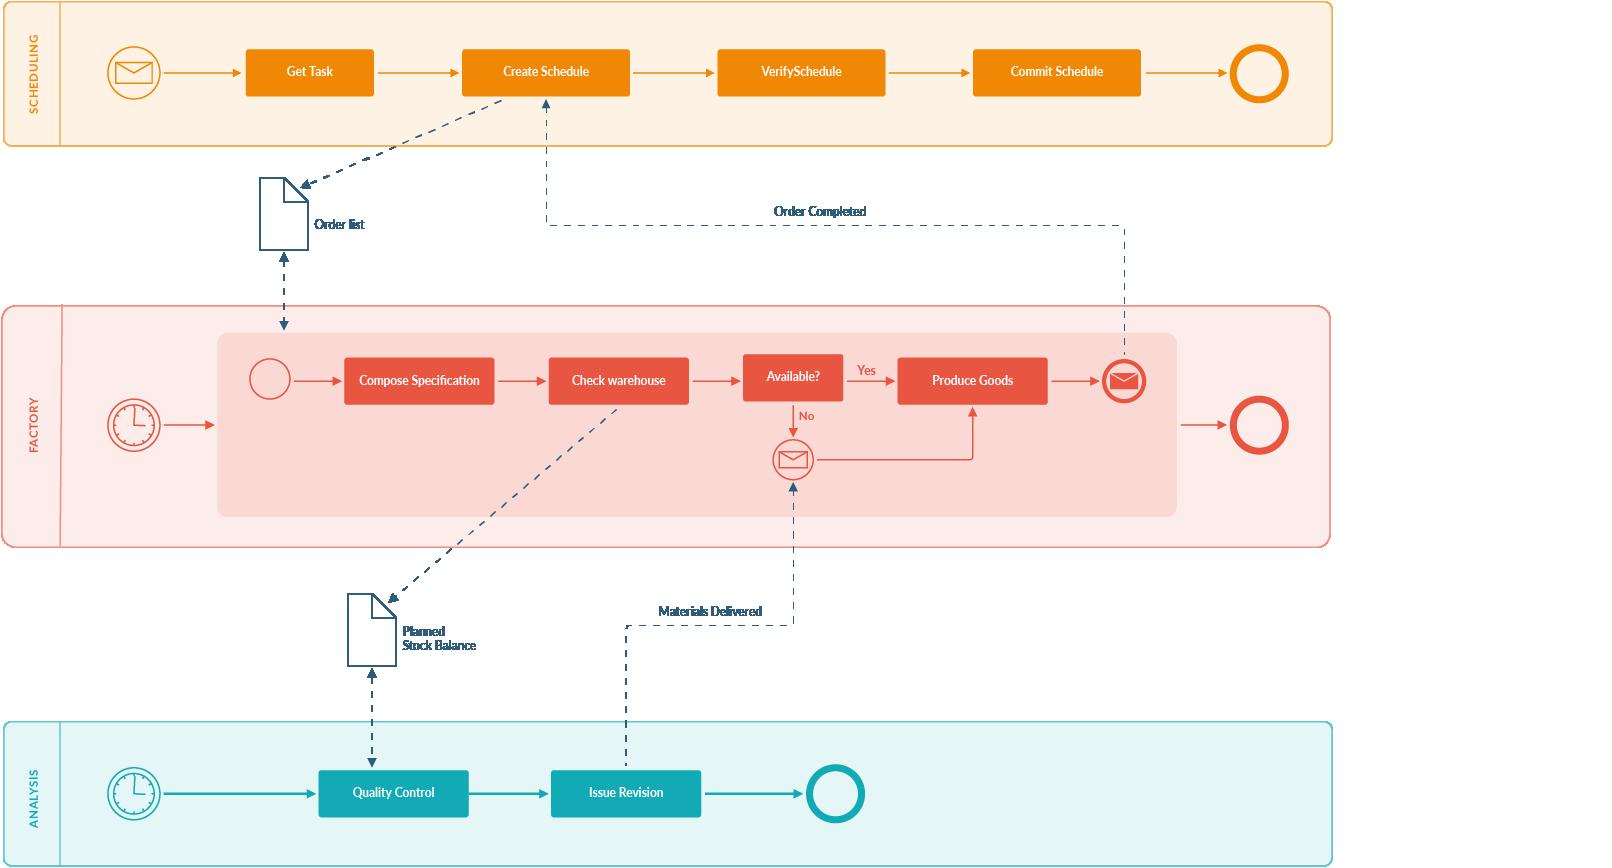 Blank Flow Chart Template Free Luxury Empty Flow Chart Template Prisma Flow Chart Template In 2020 Flow Chart Template Process Flow Chart Template Flow Chart